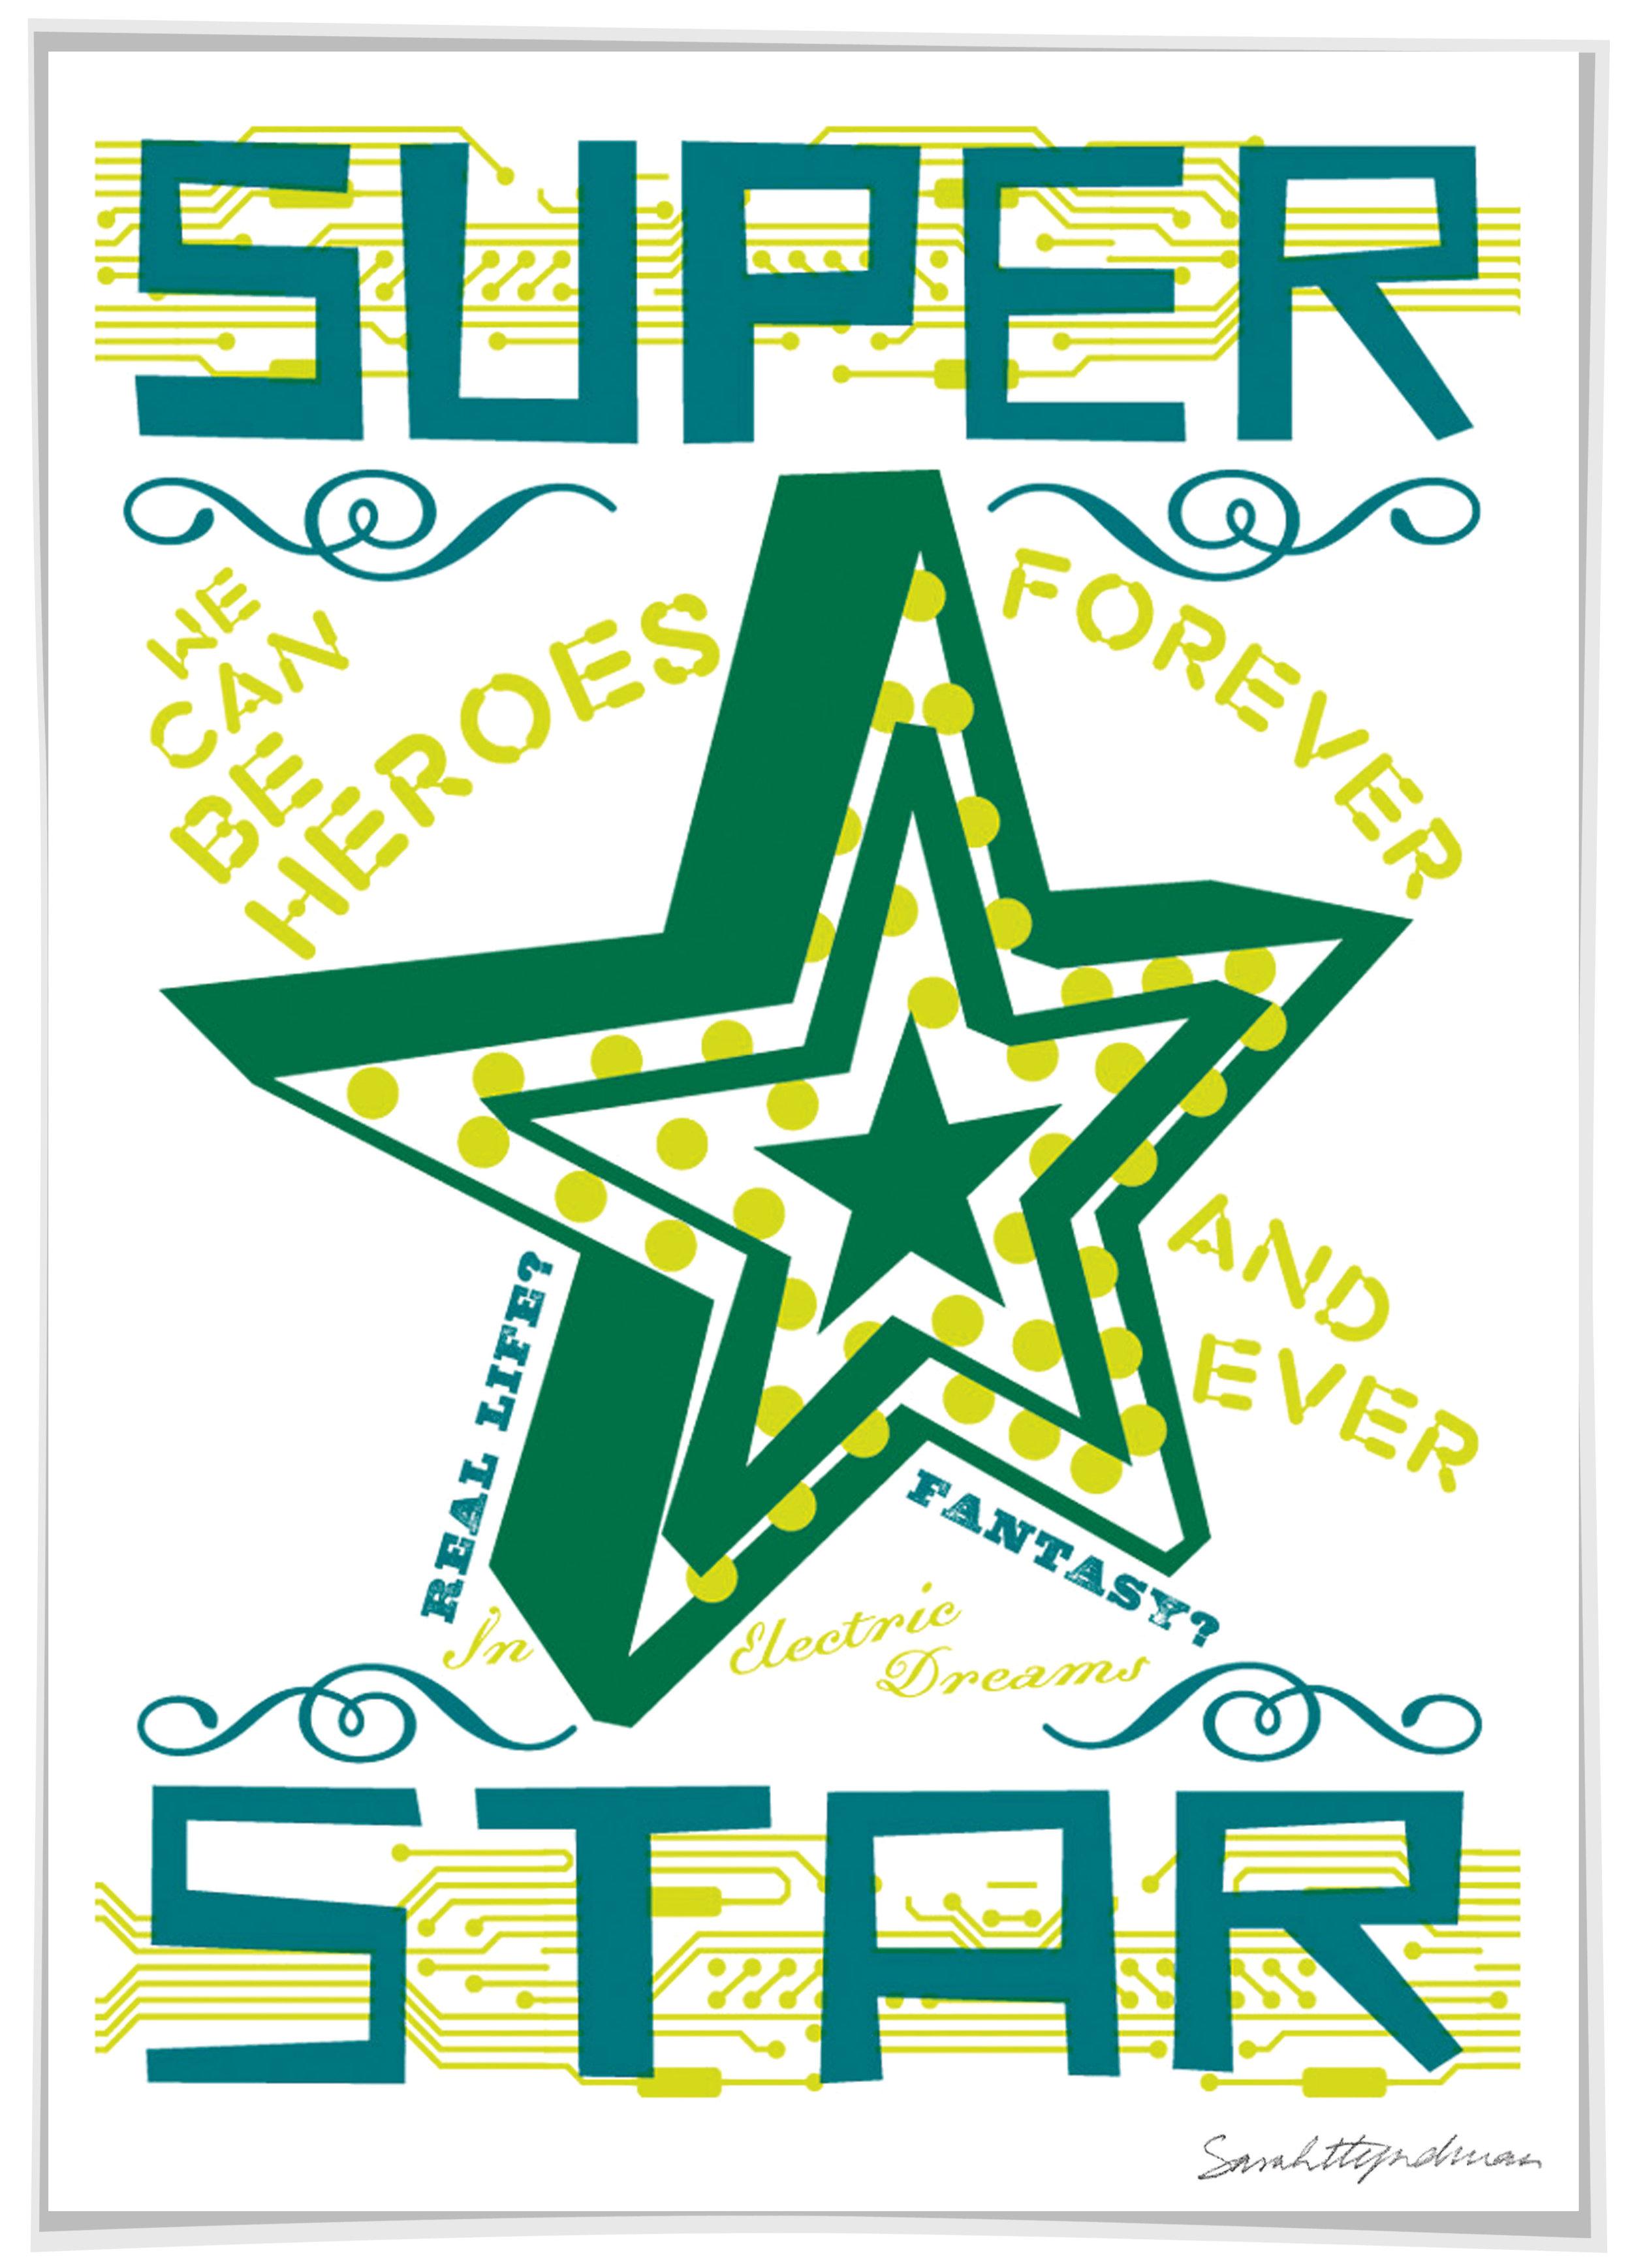 Super Star screen print by Sarah Hyndman